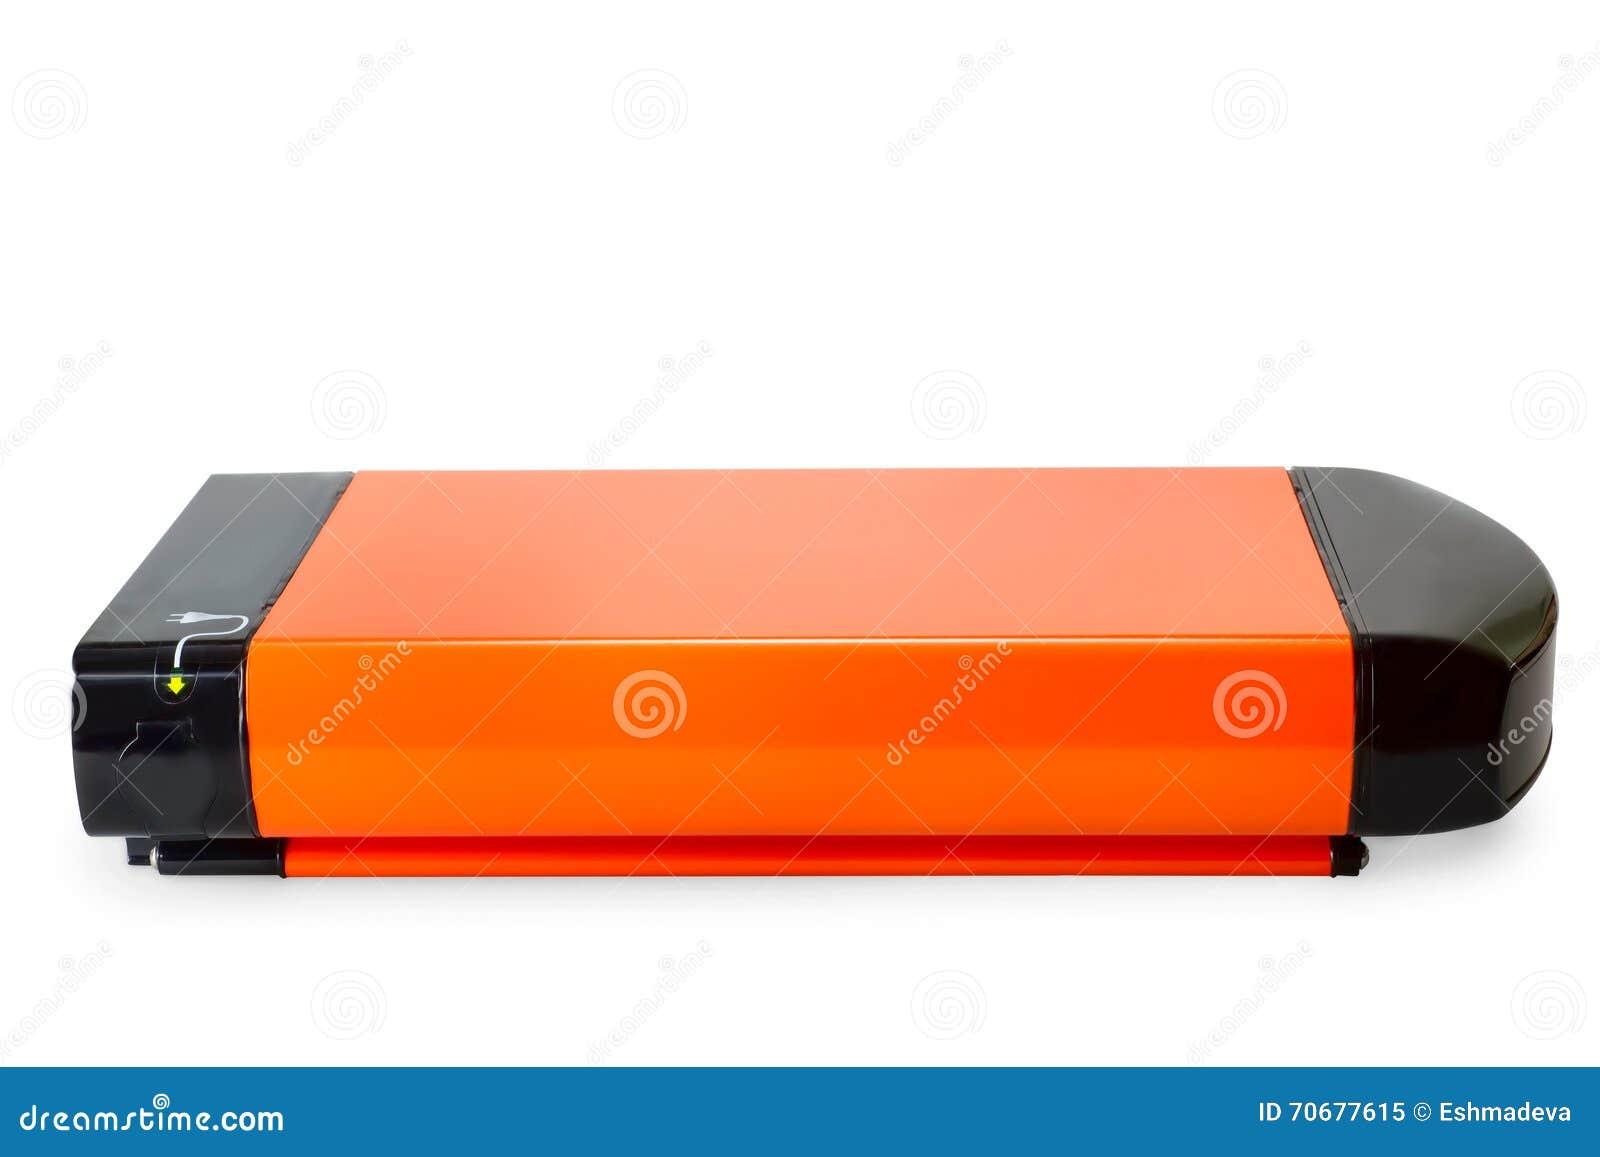 Orange li-ion battery for e-bike